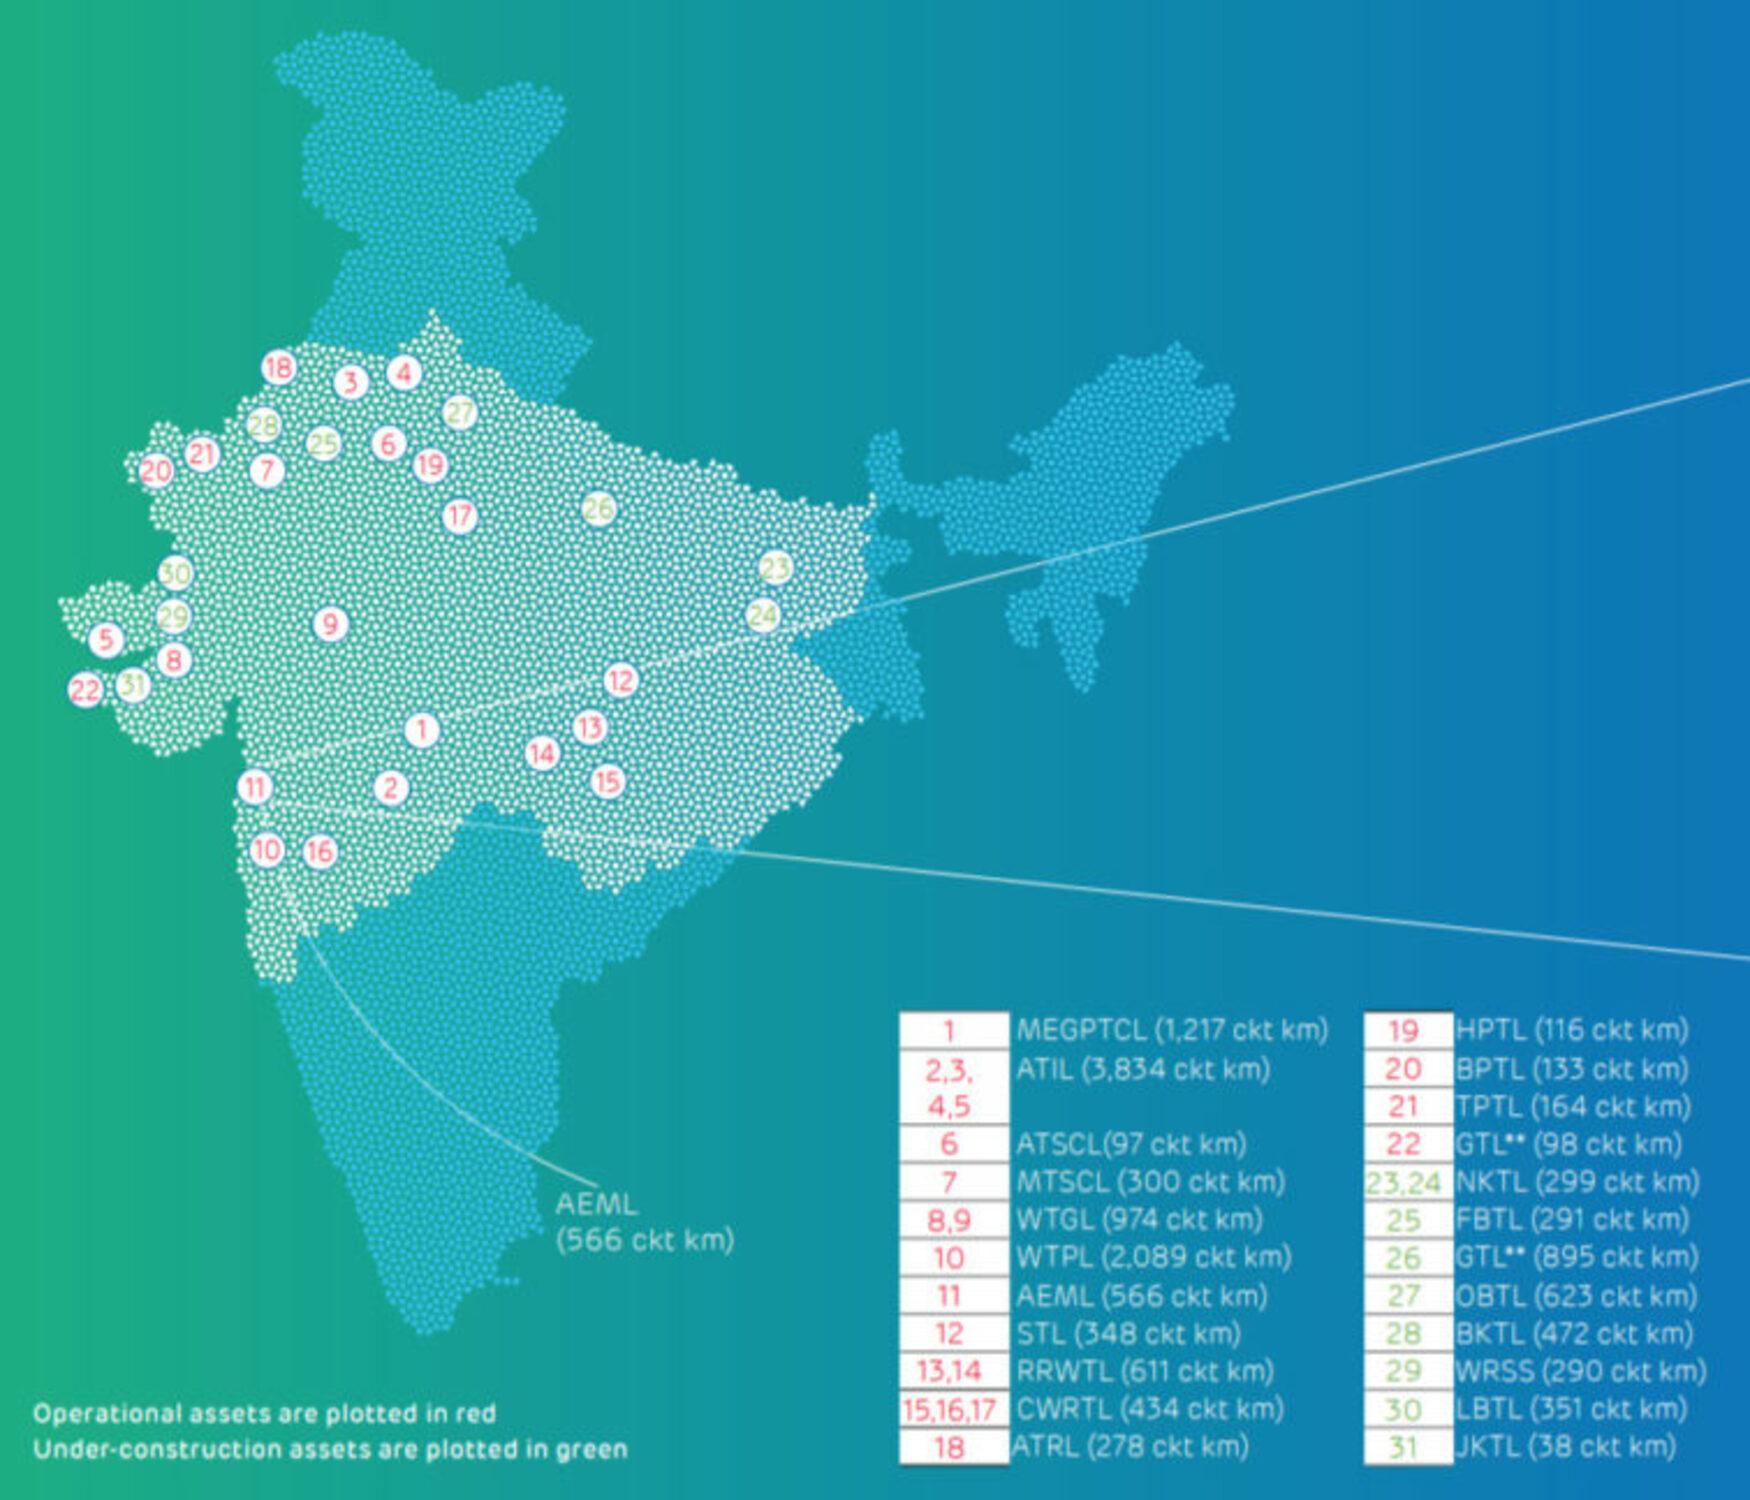 Adani Transmission Limited Assets